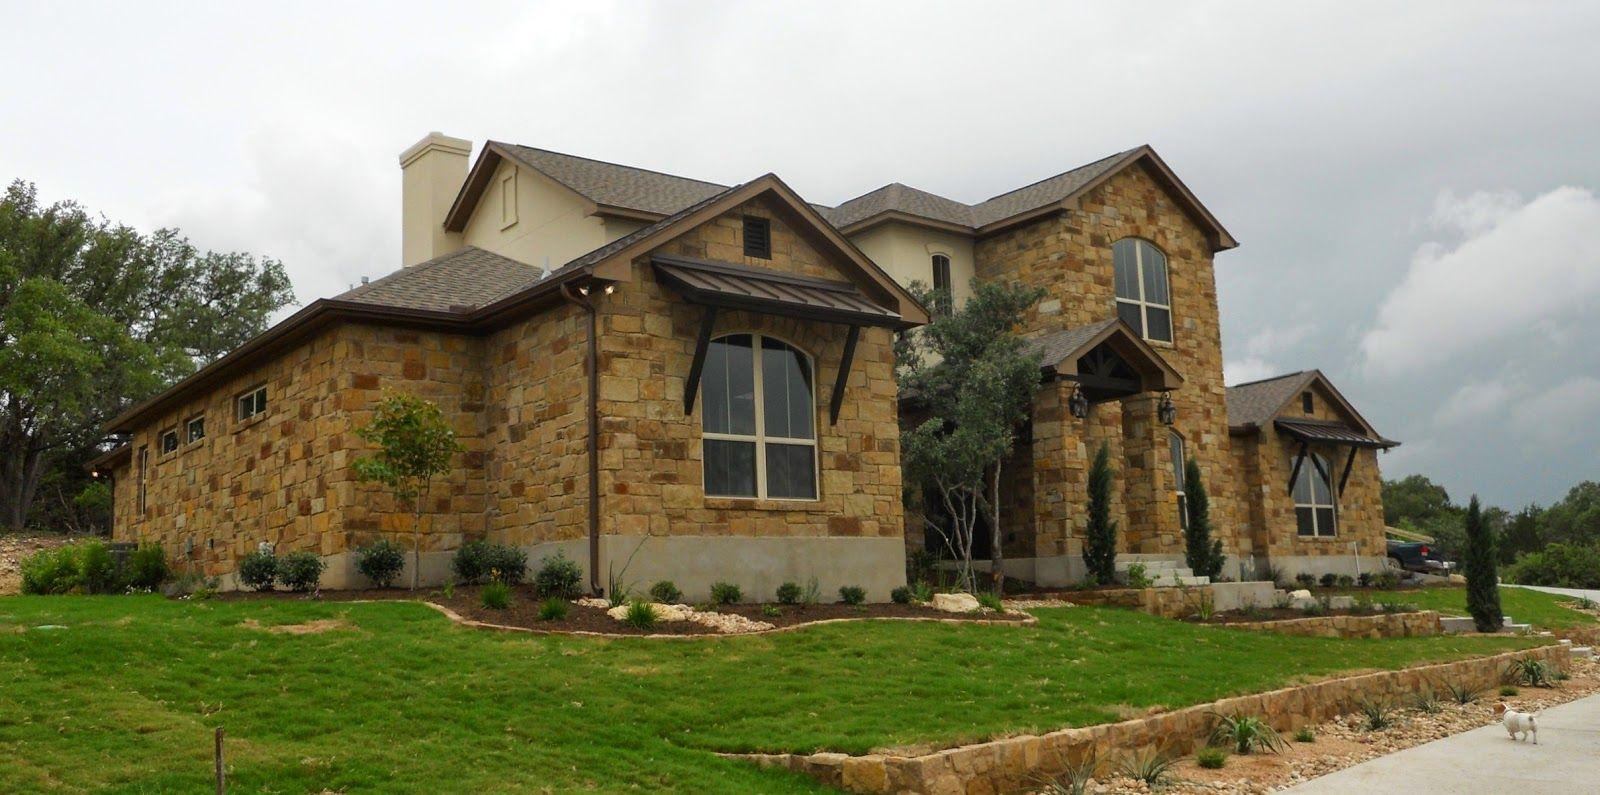 Rob Sanders Designer Custom Home & Remodel Design Austintecture for Central Texas